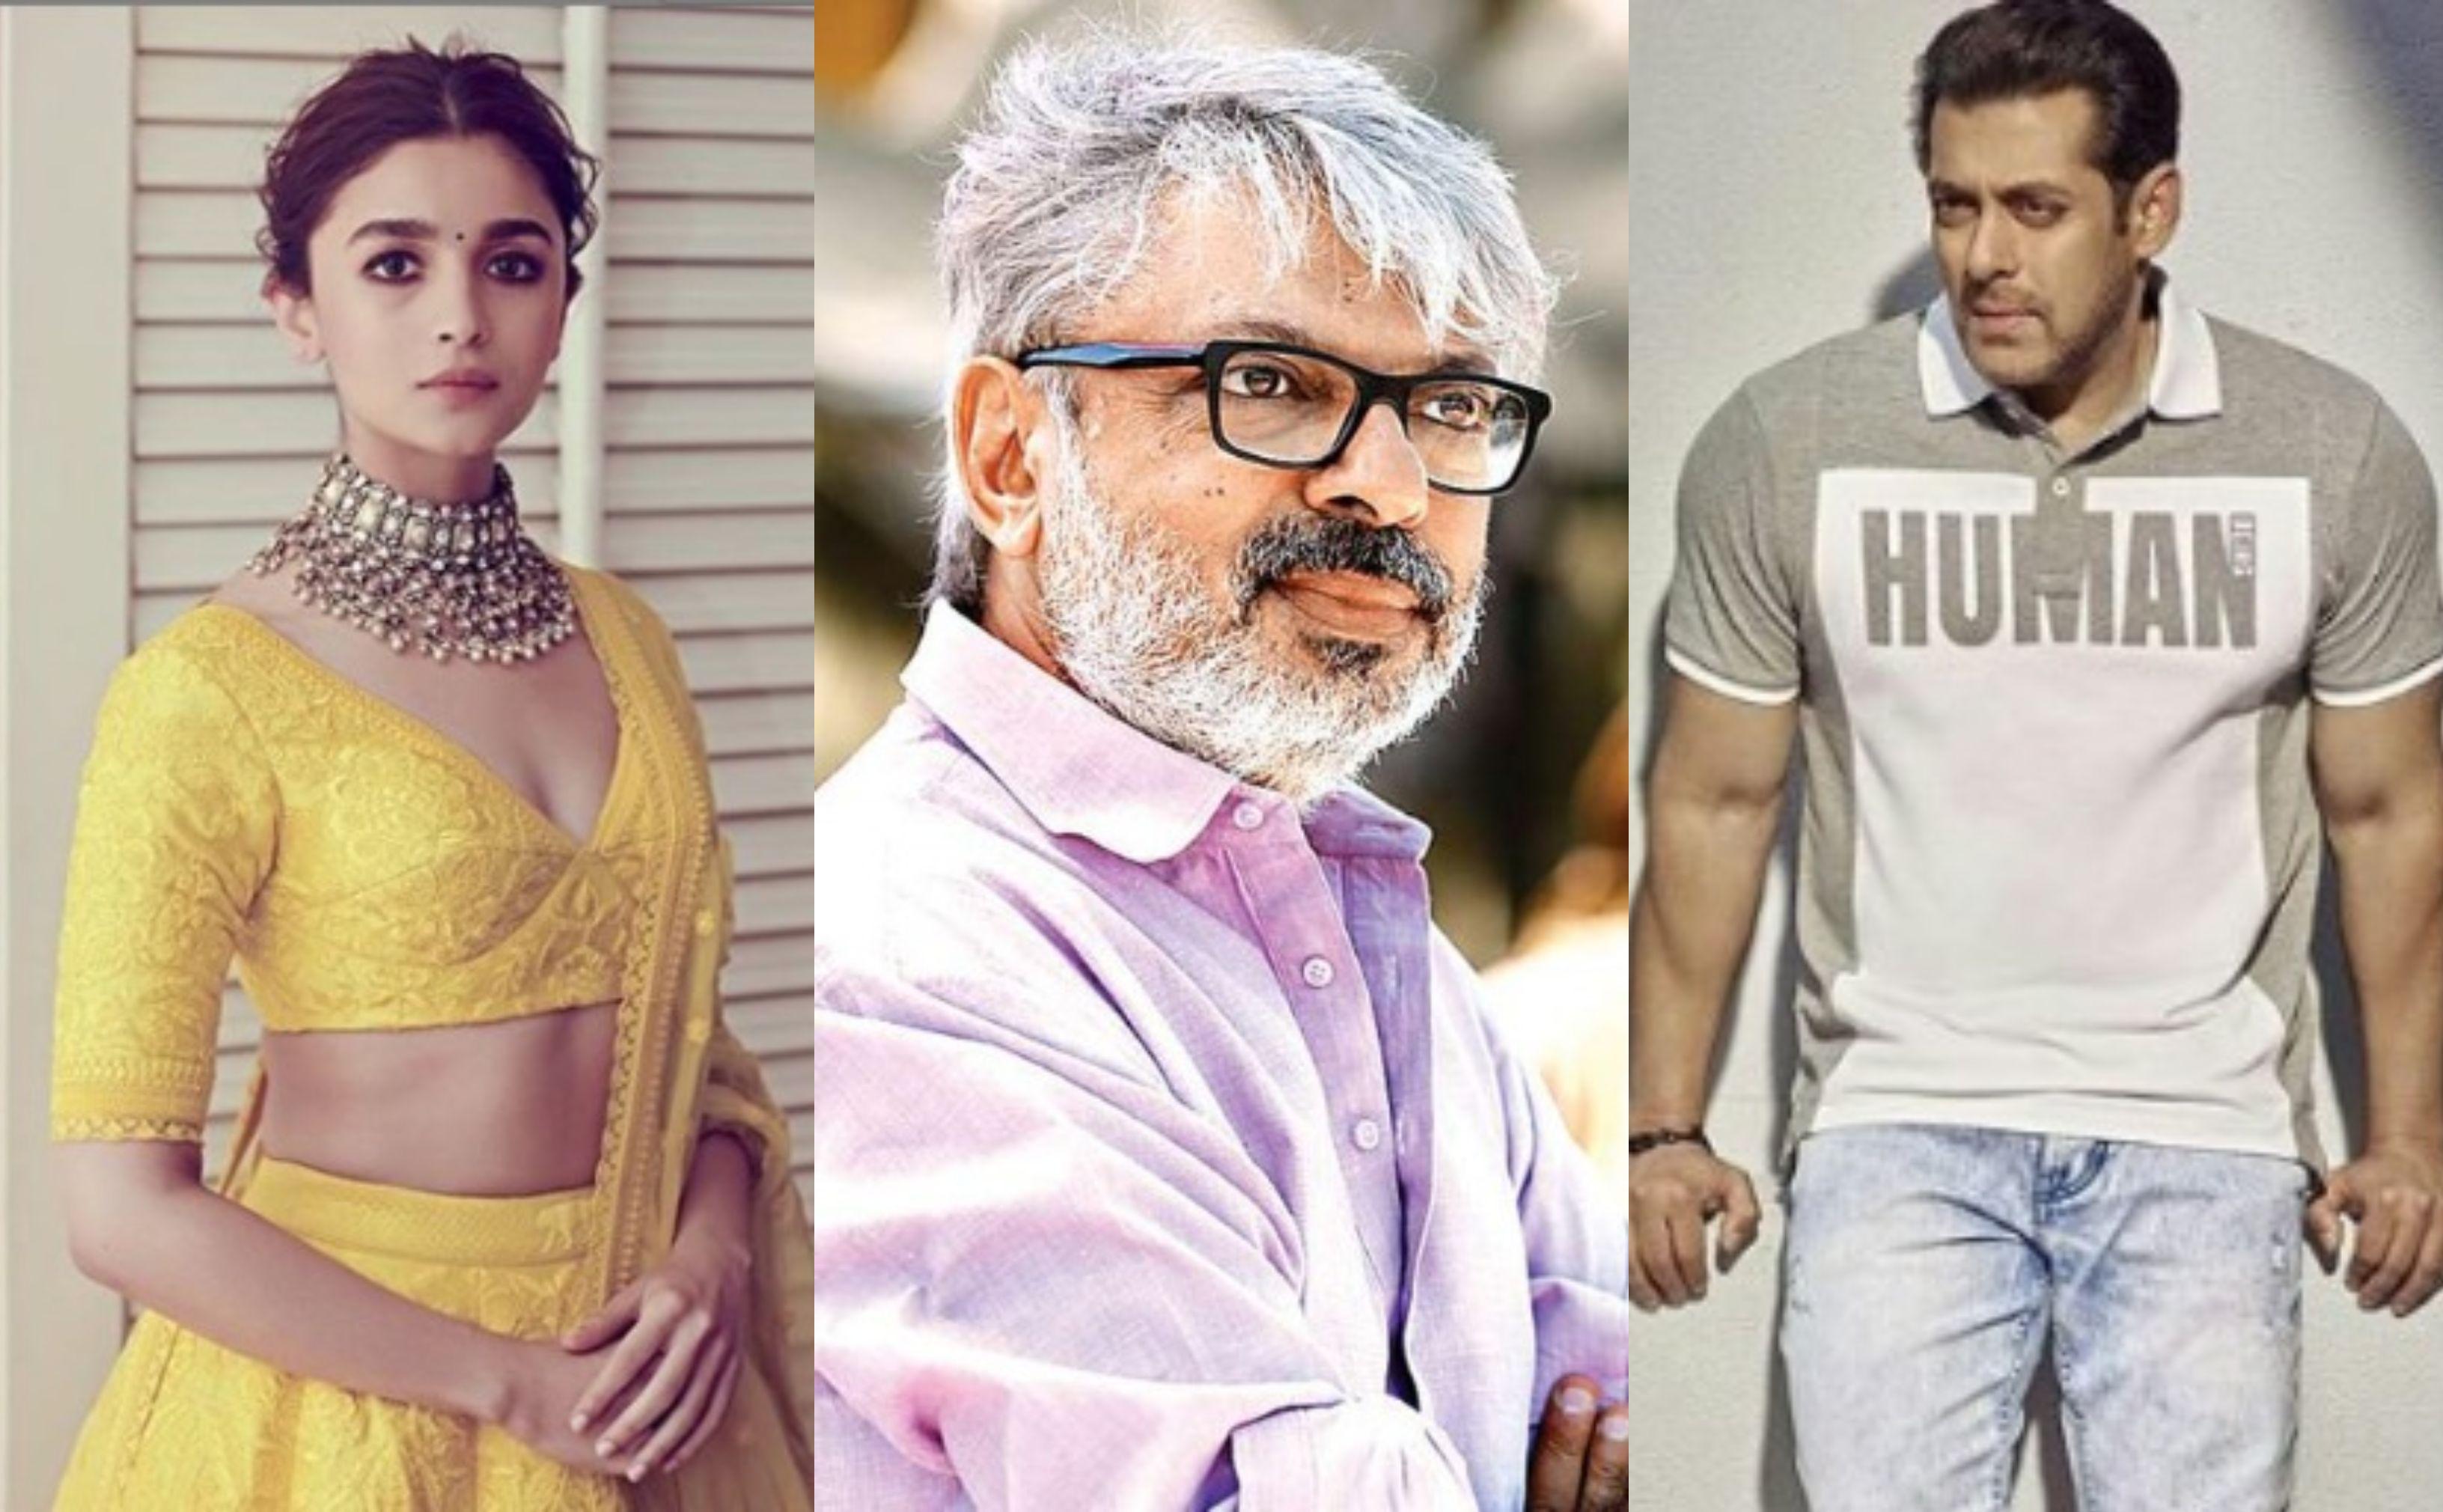 Sanjay Leela Bhansali's Next To Star Salman Khan And Alia Bhatt